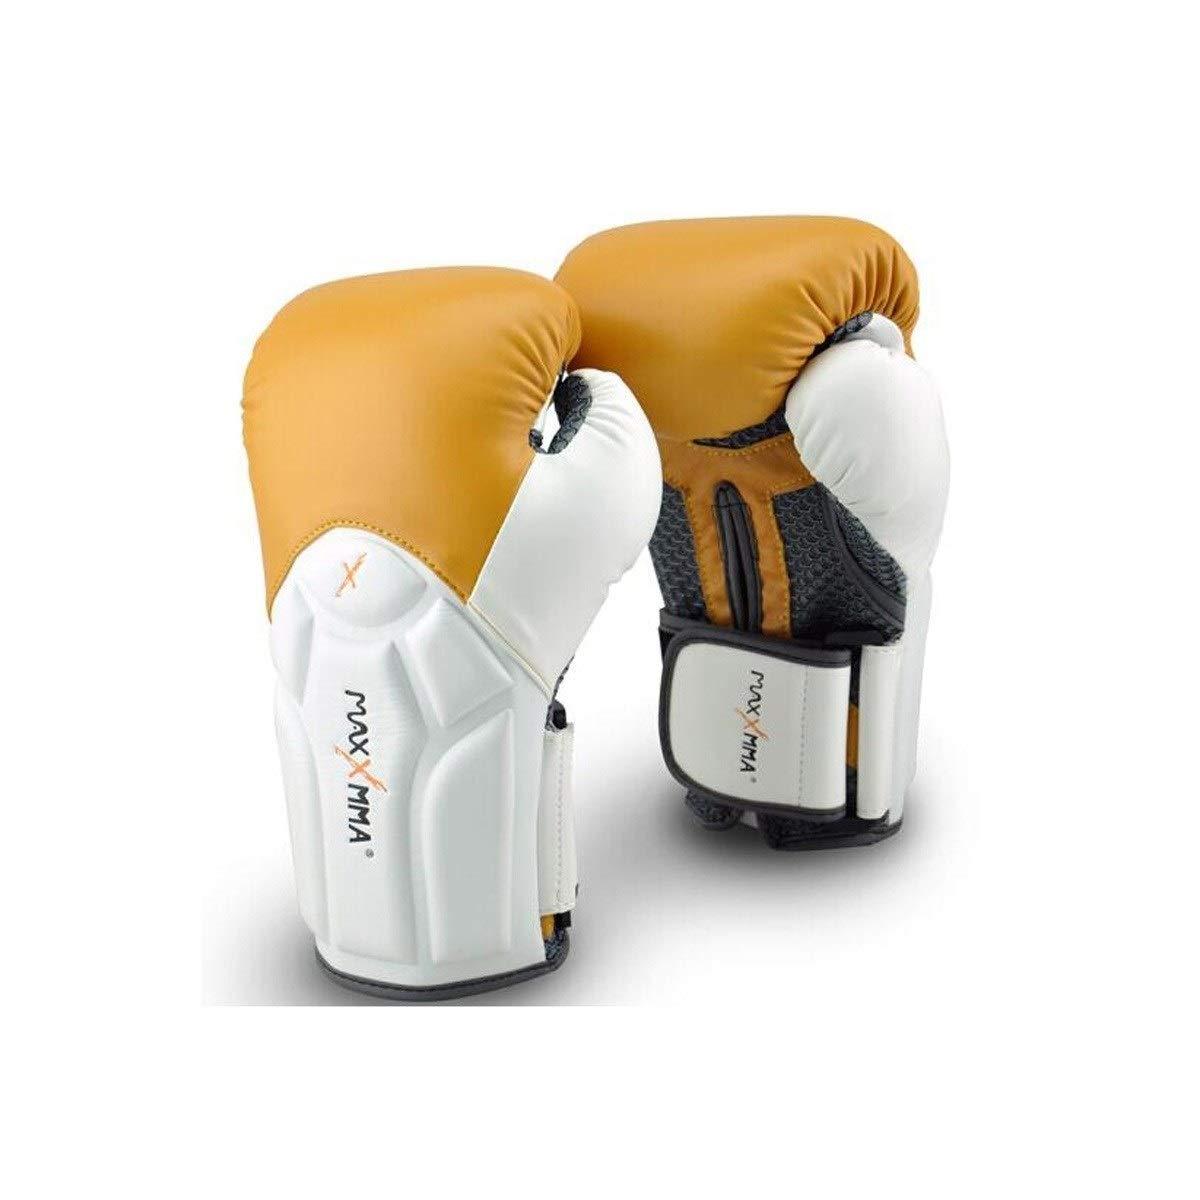 KUCHEQICHE ボクシングリストグローブキャメルフィットネストレーニングムエタイサンダ格闘技ファイティンググローブキャメルファッション12オンス (Color : Multi-colo赤) Multi-colo赤